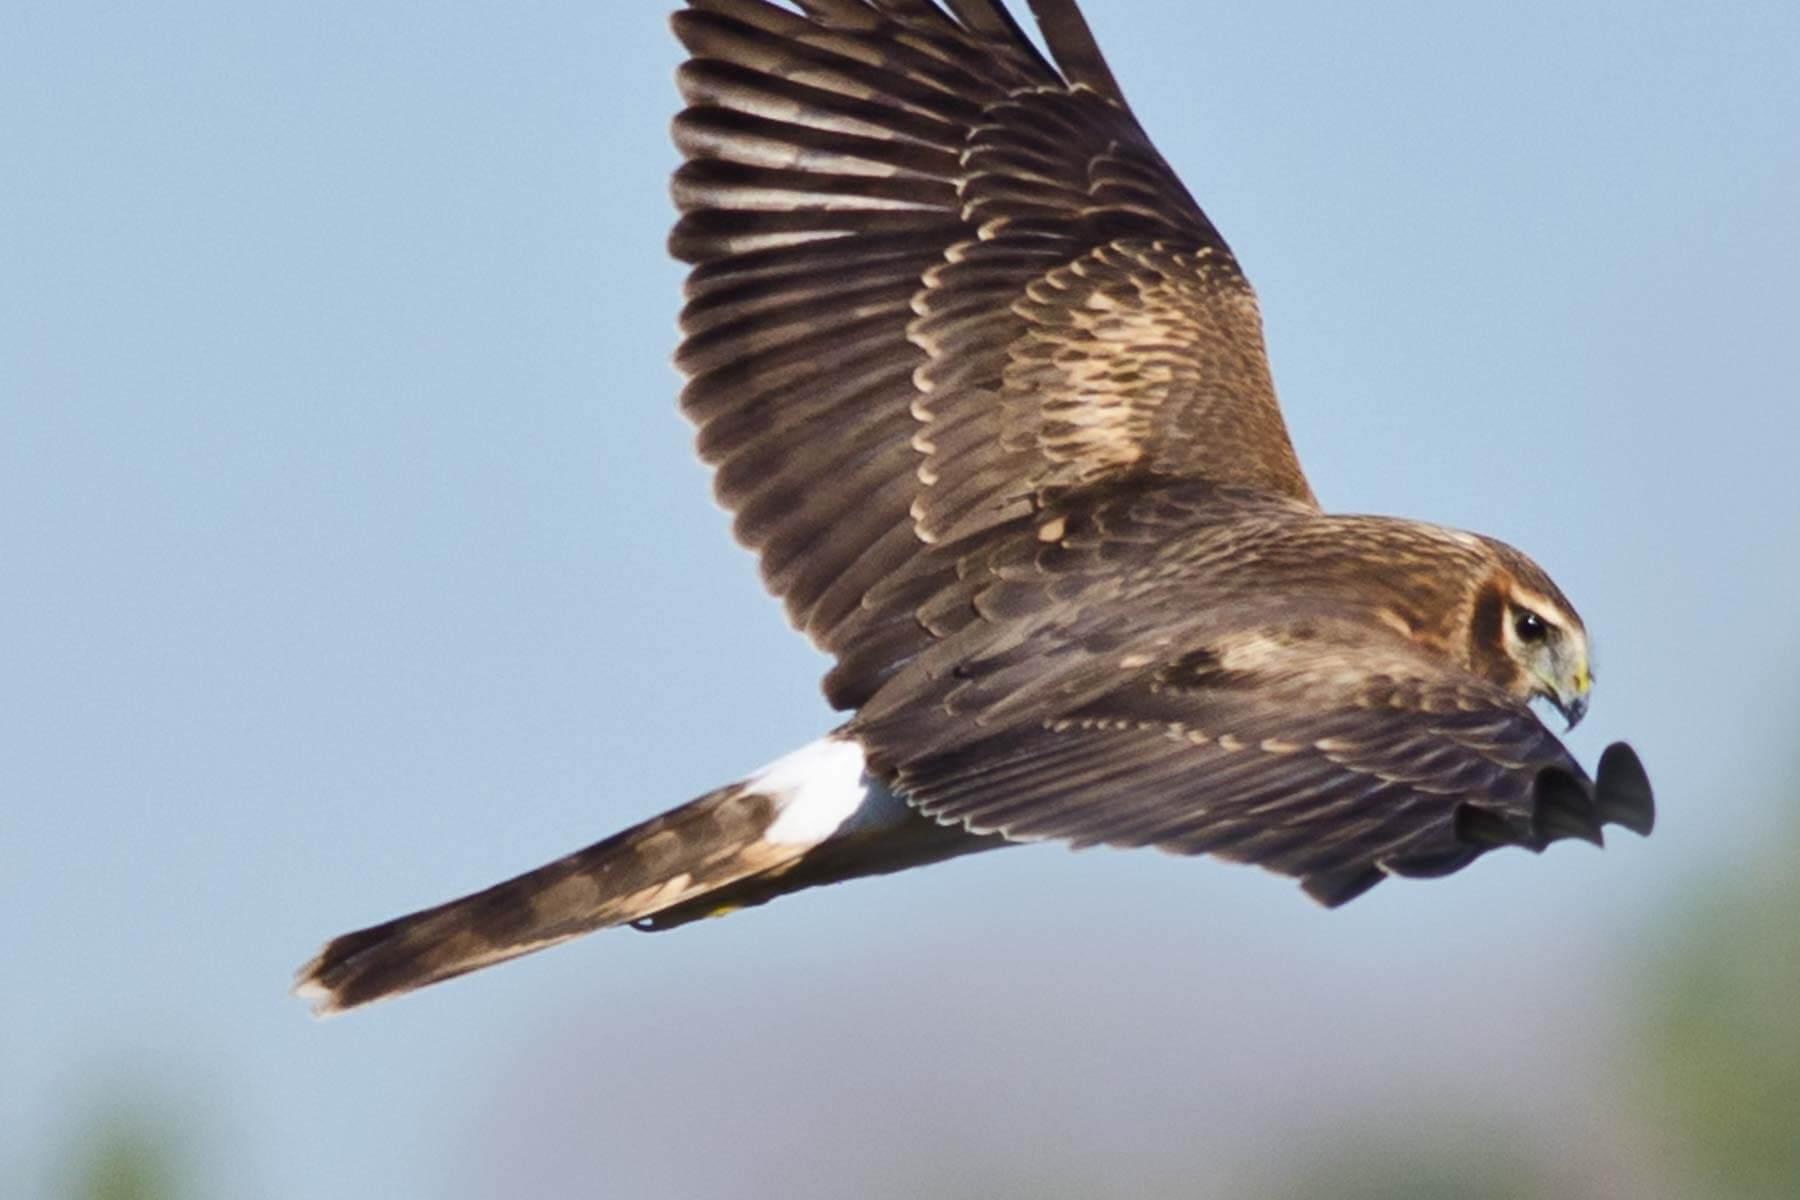 A harrier flying